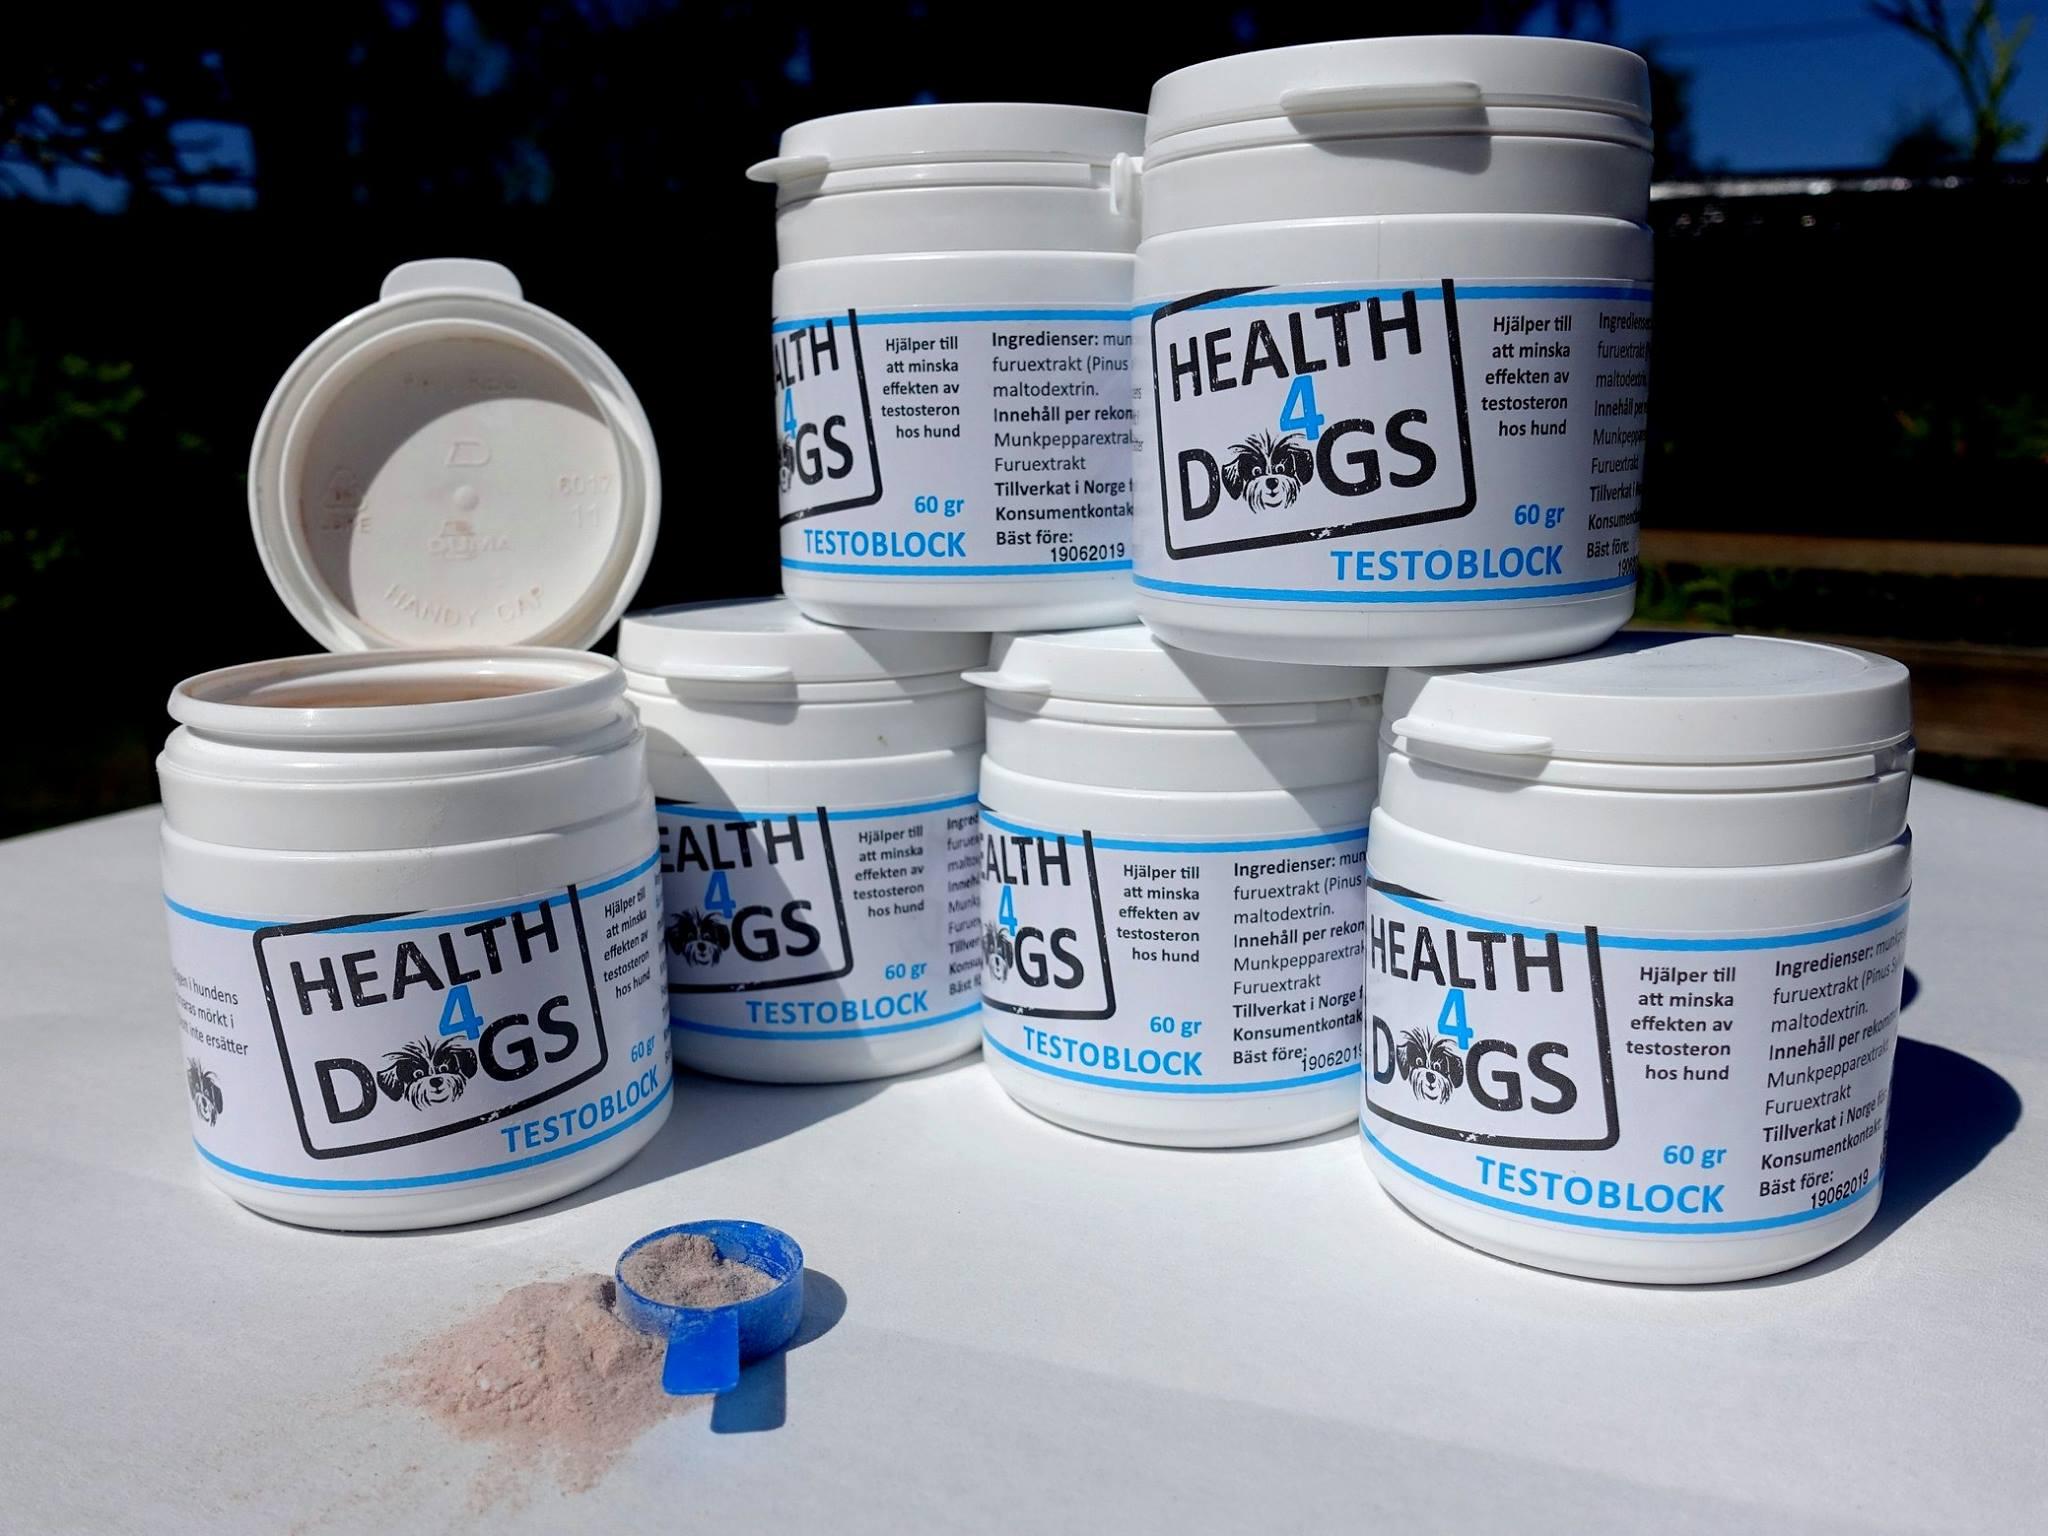 Health4dogs Testoblock